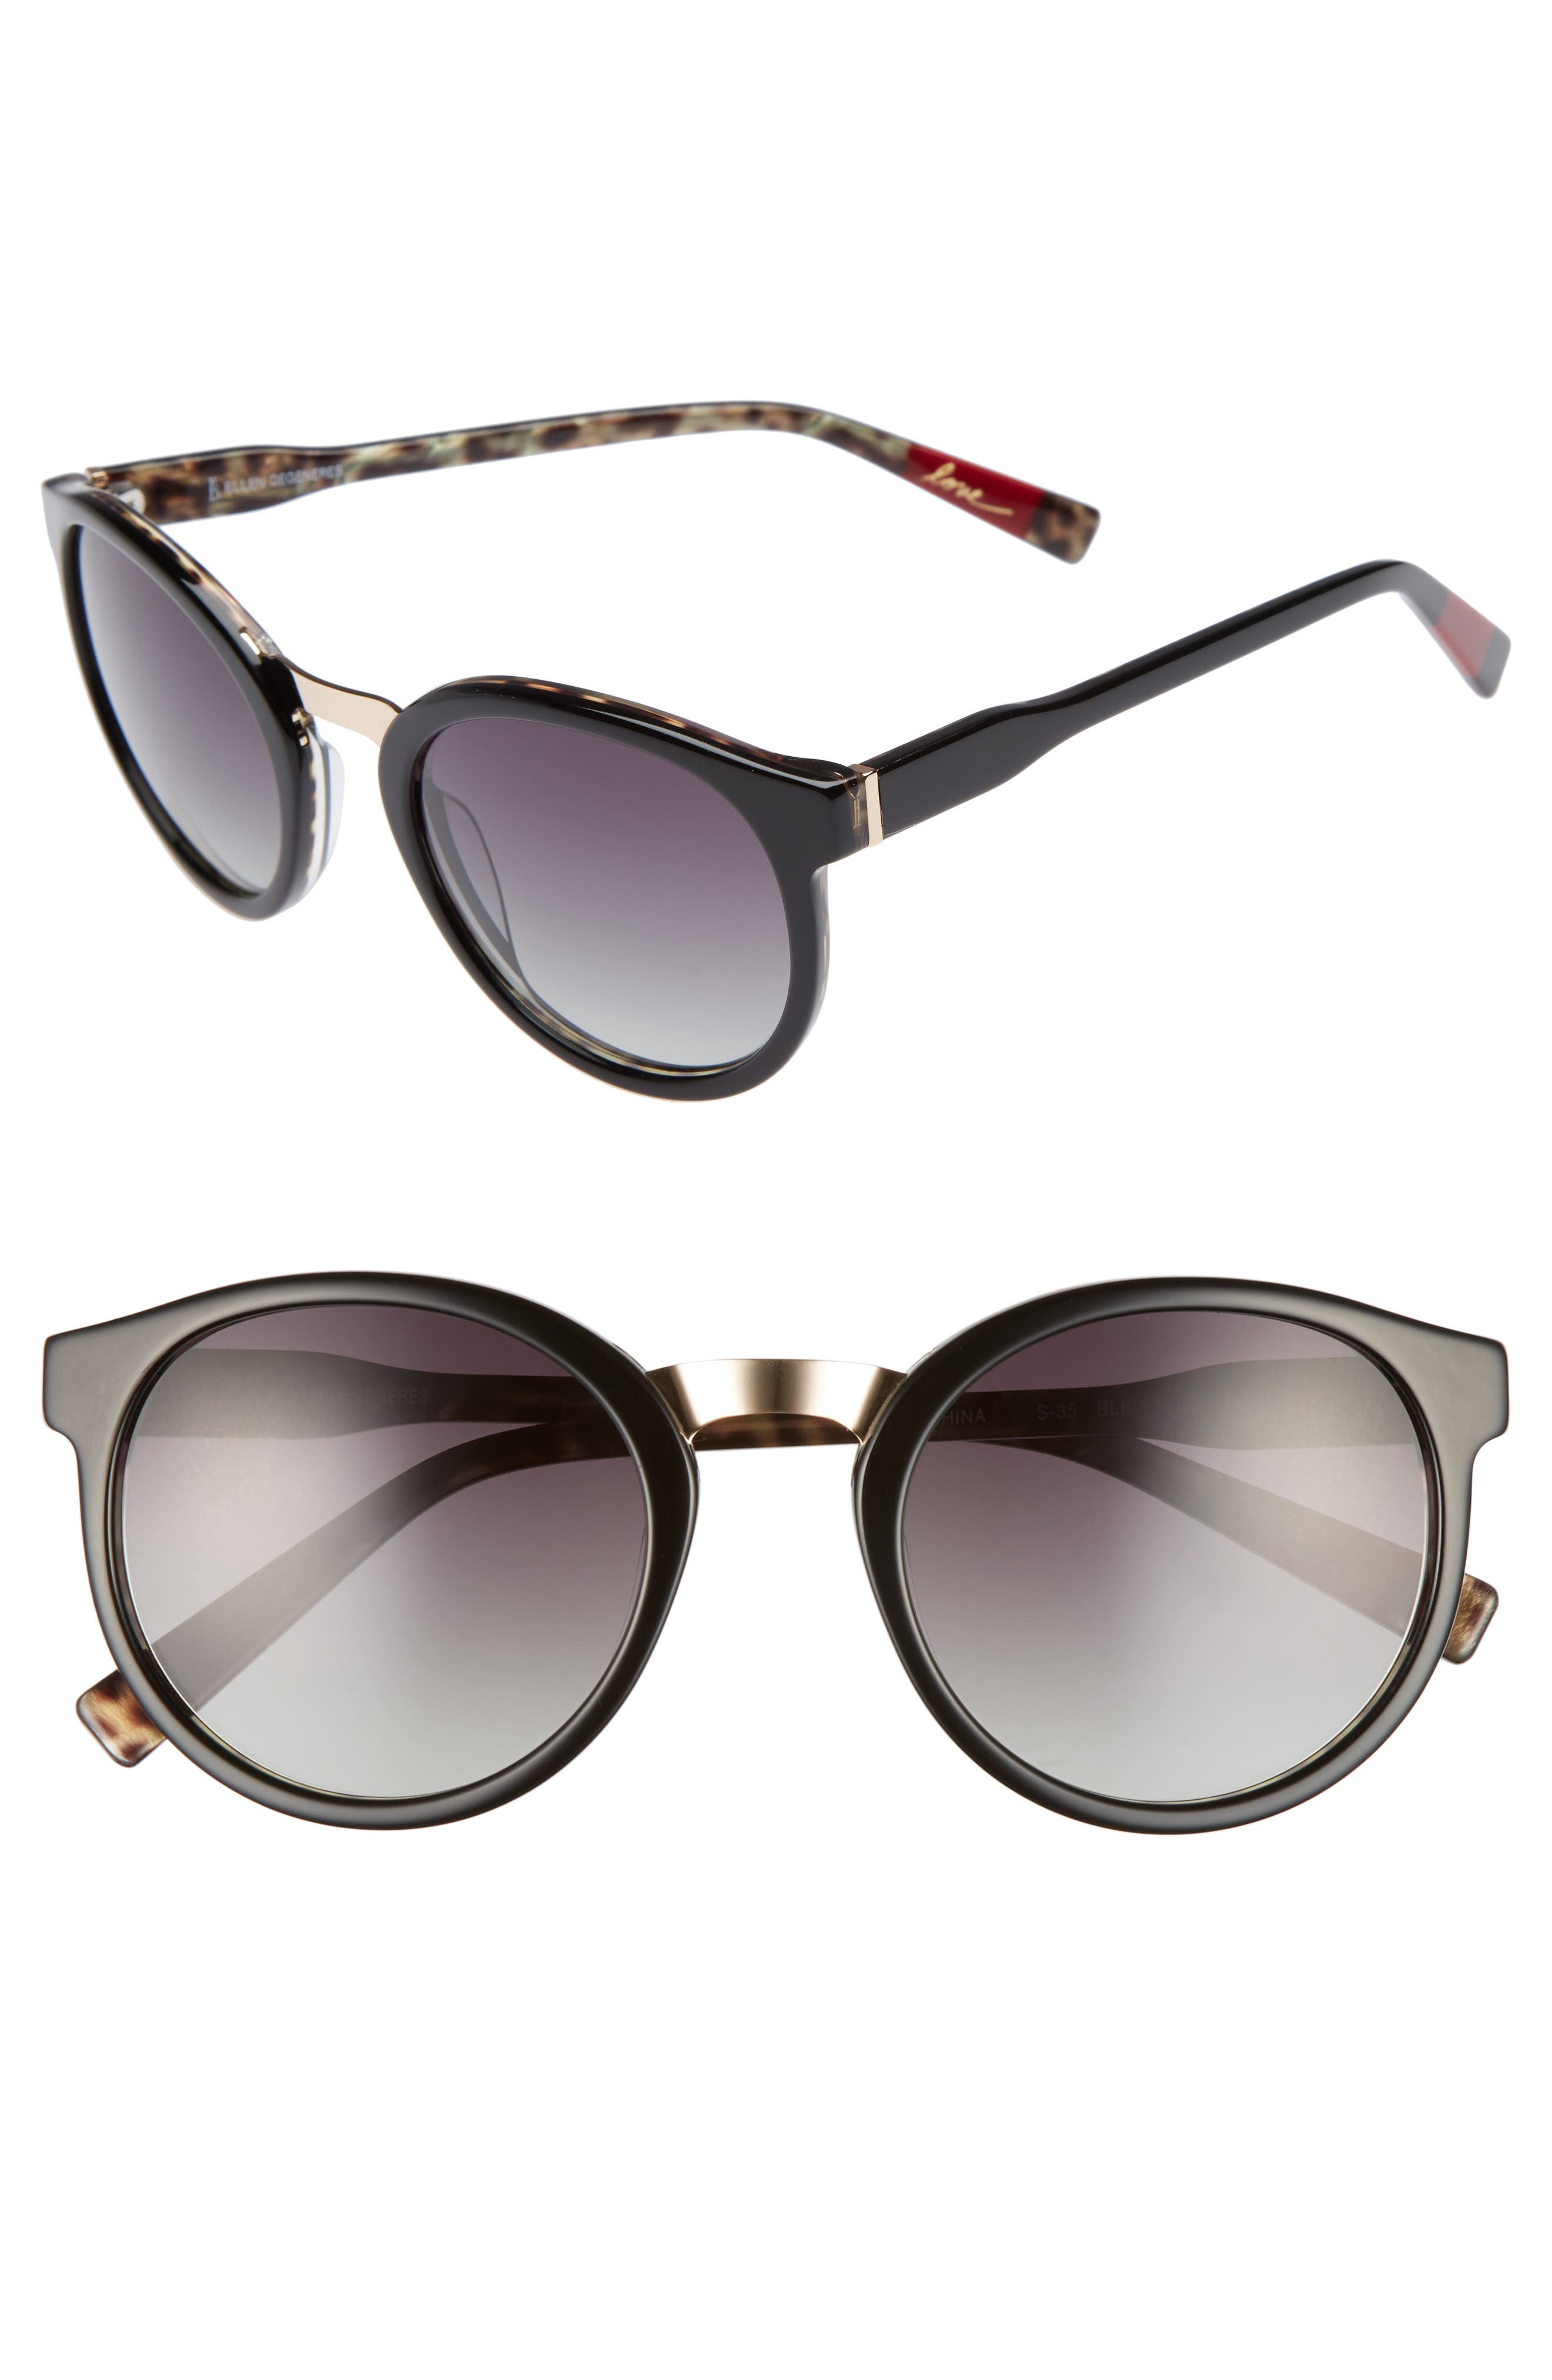 53mm Round Sunglasses,                         Main,                         color,